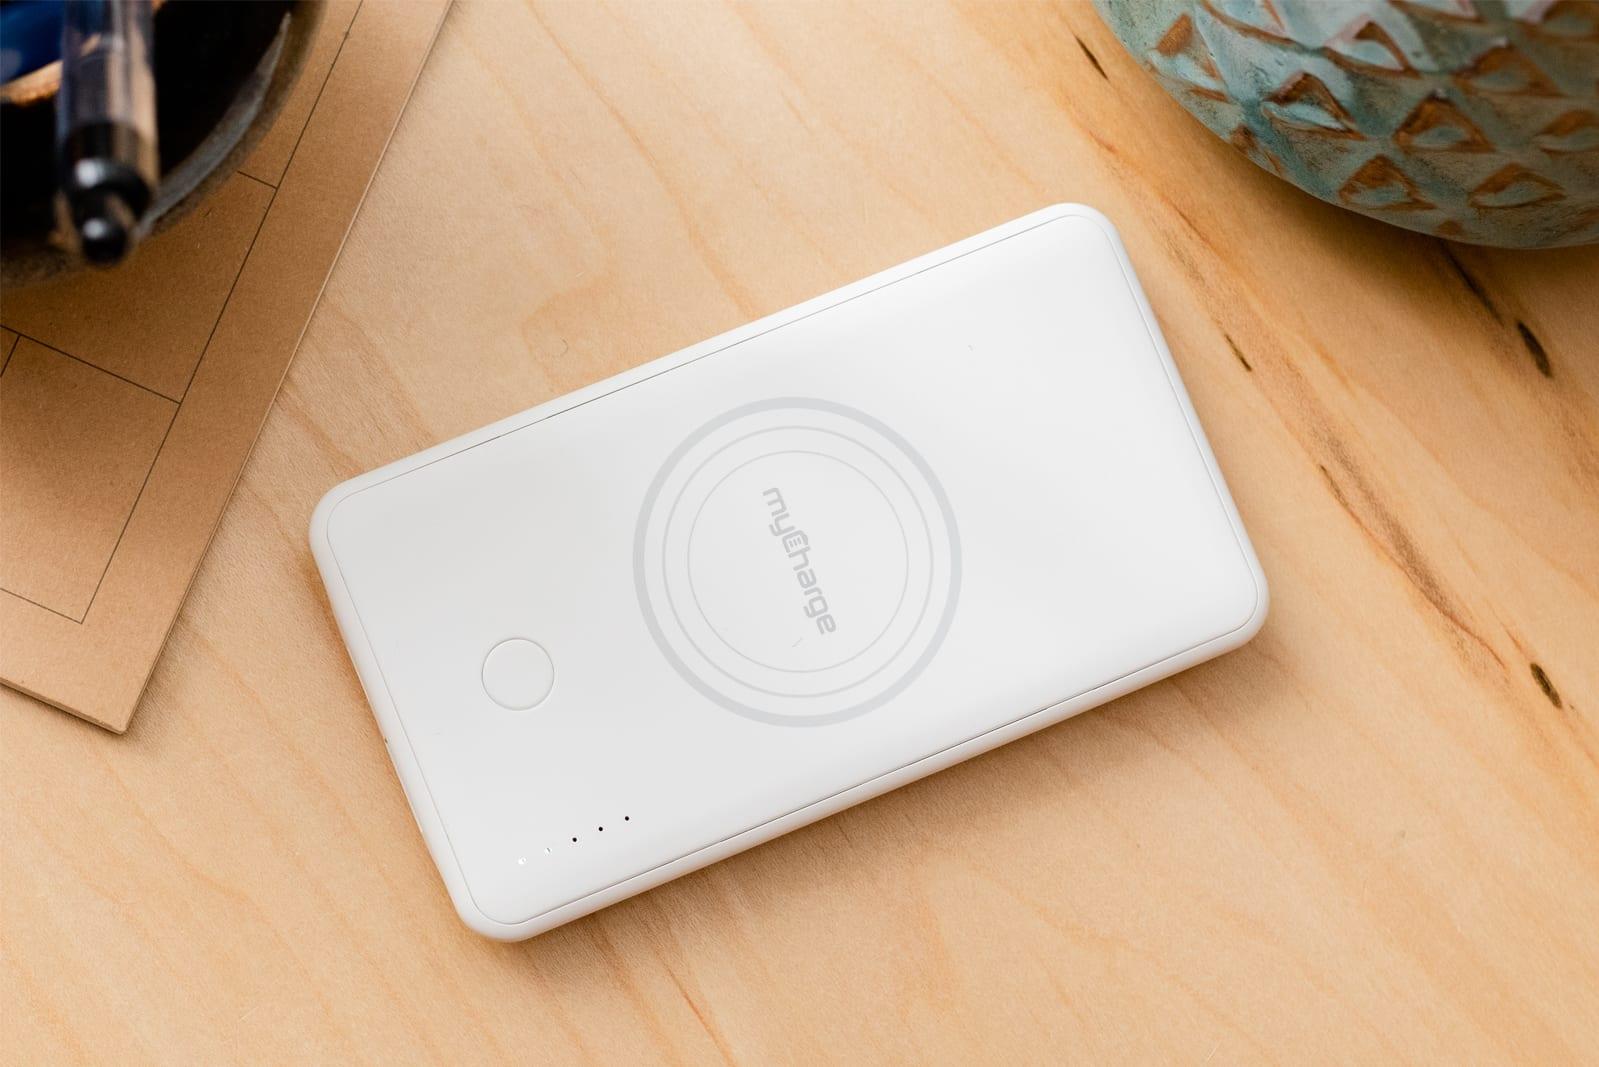 Qi wireless charging banks